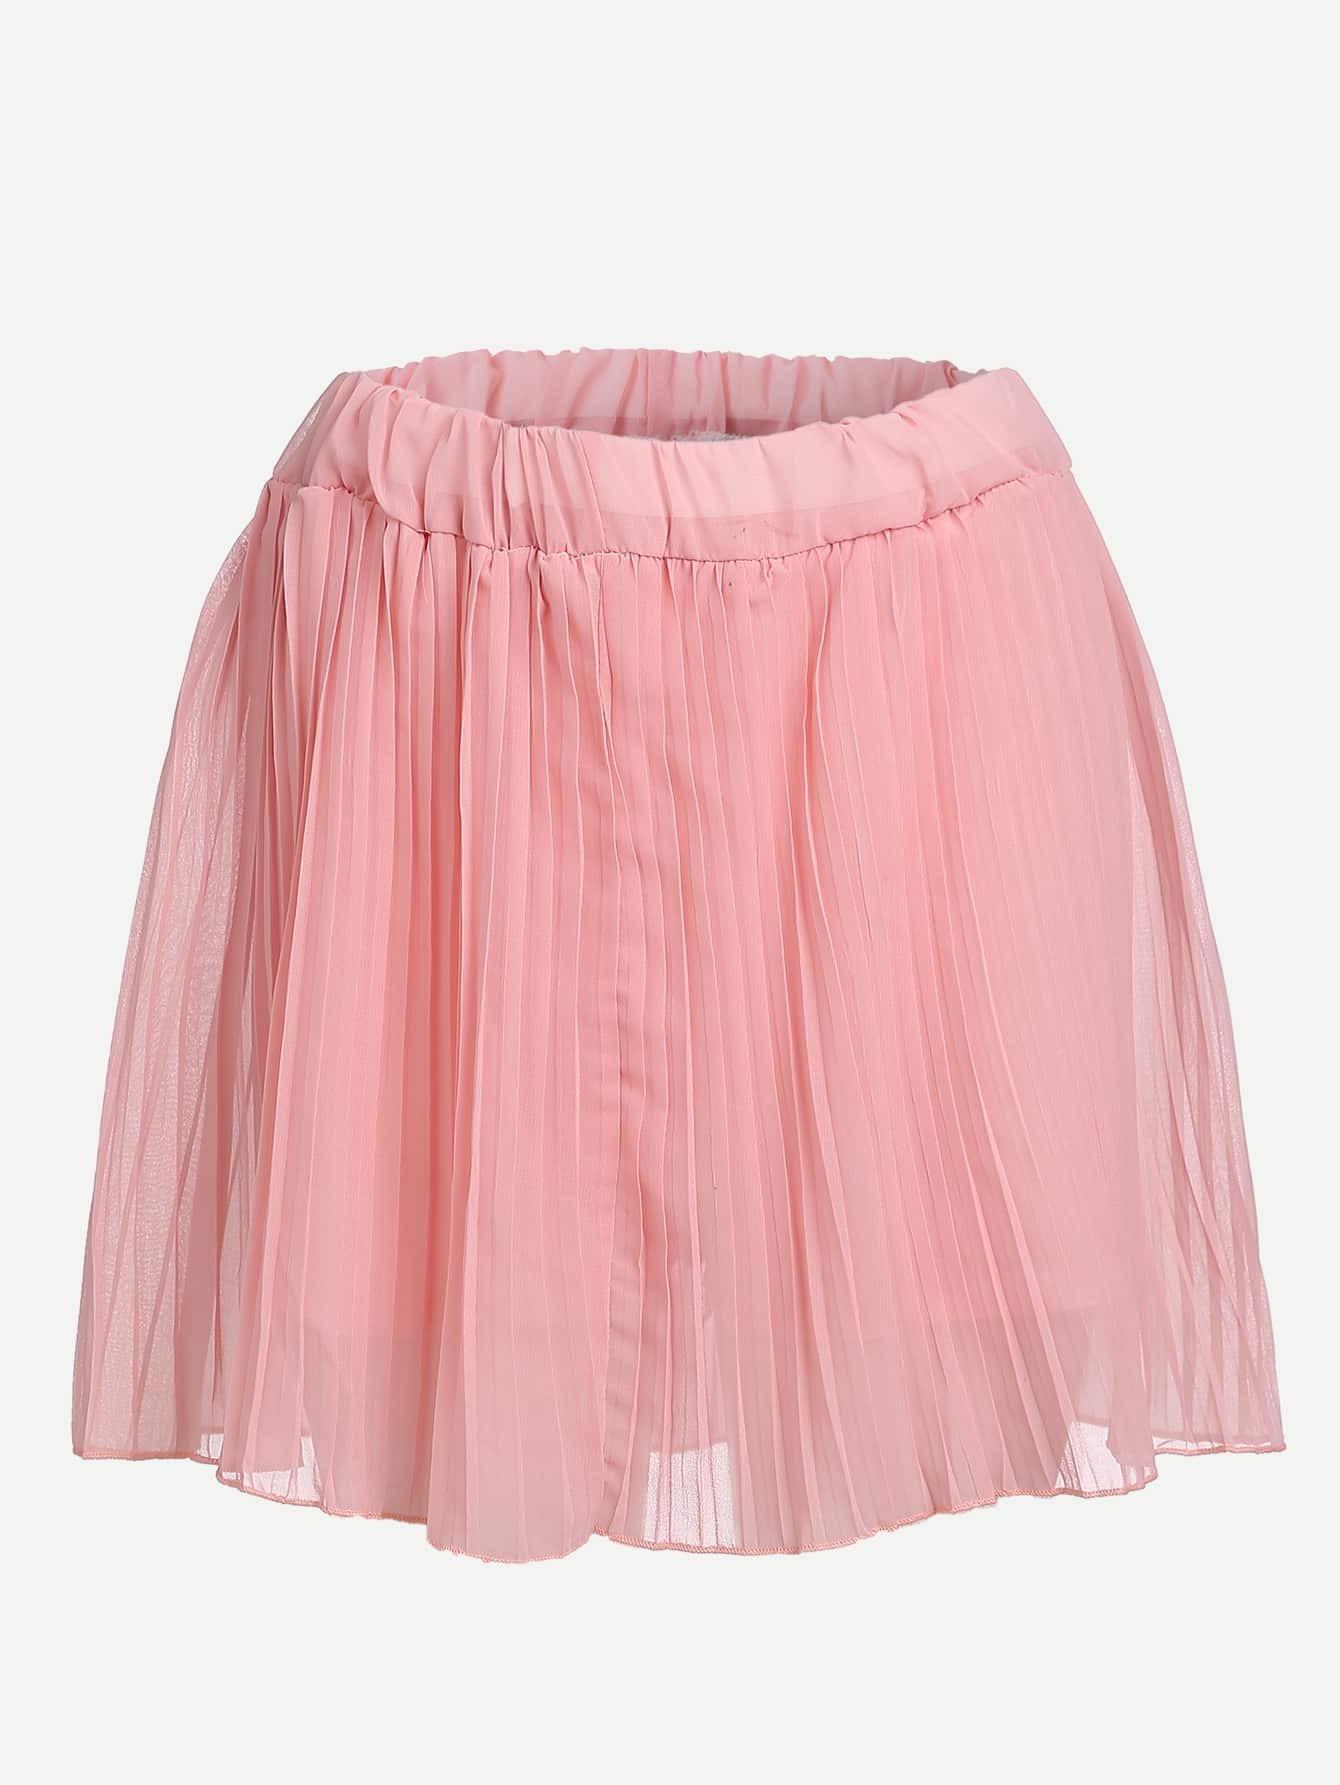 pink elastic waist pleated chiffon skirt